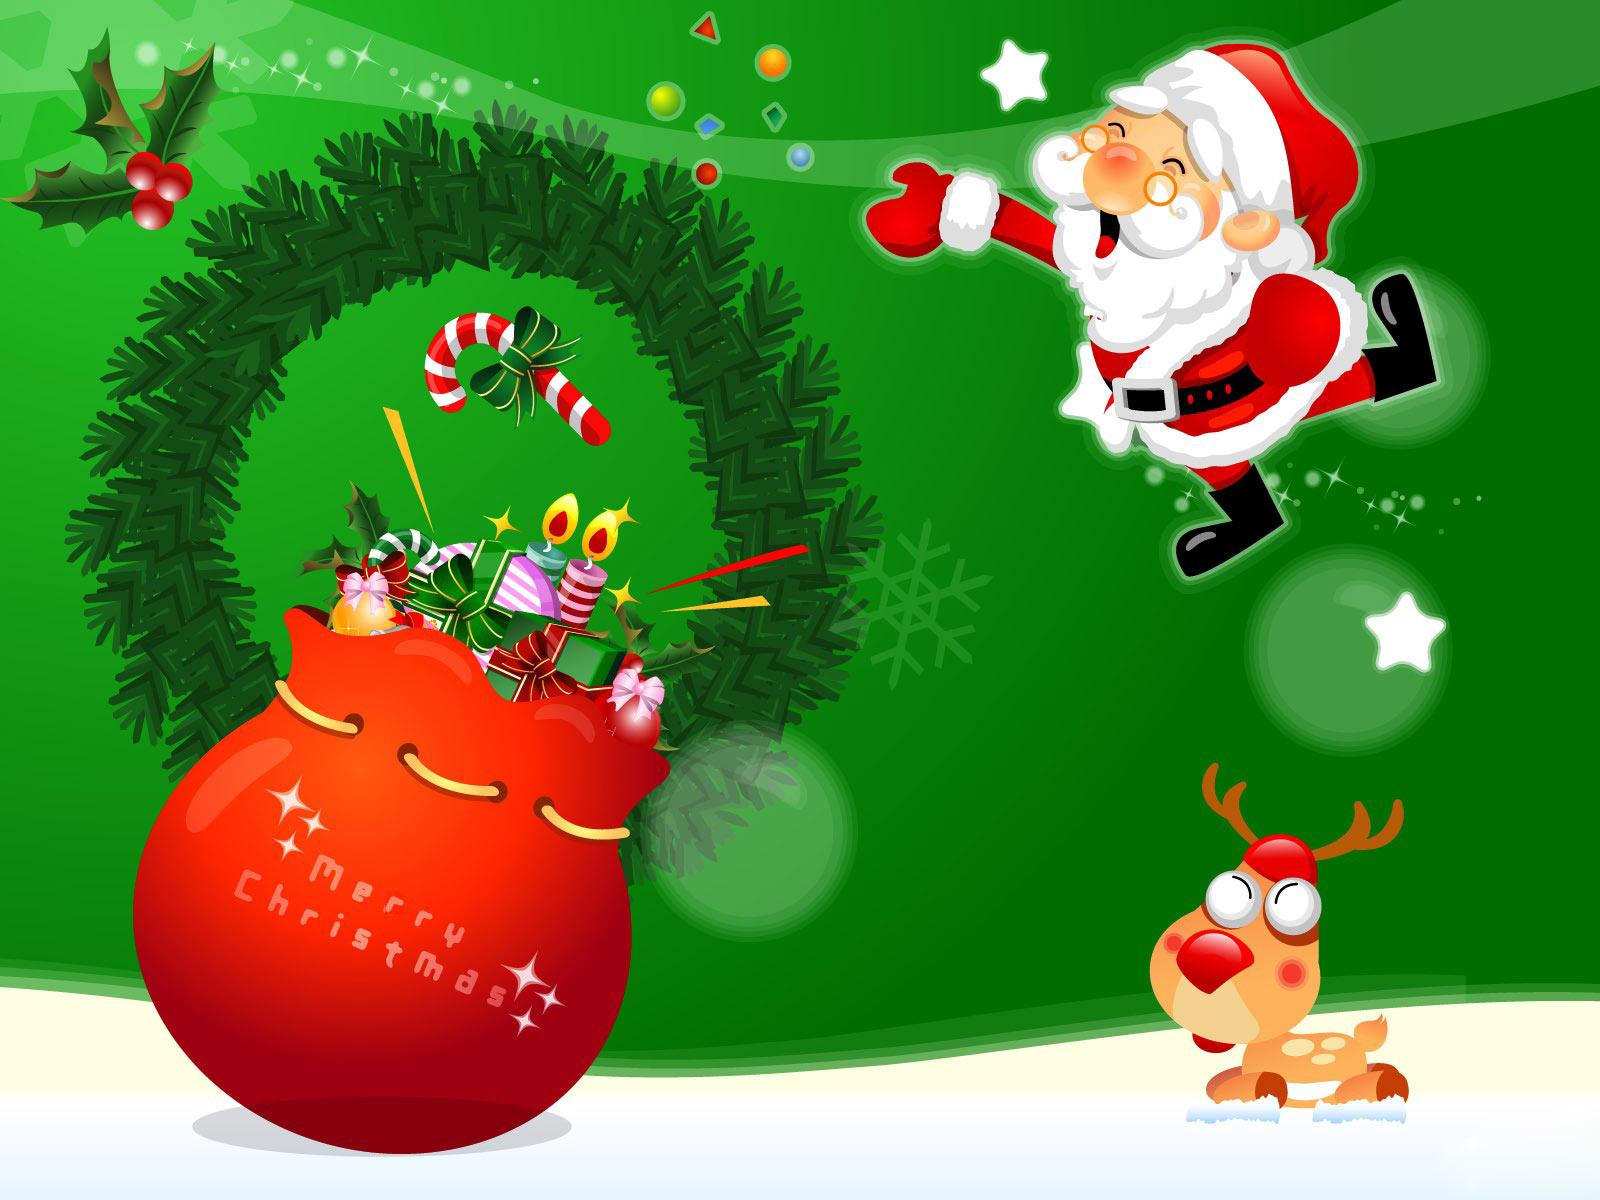 Christmas Ipad Backgrounds Free: Free IPad Wallpaper Christmas